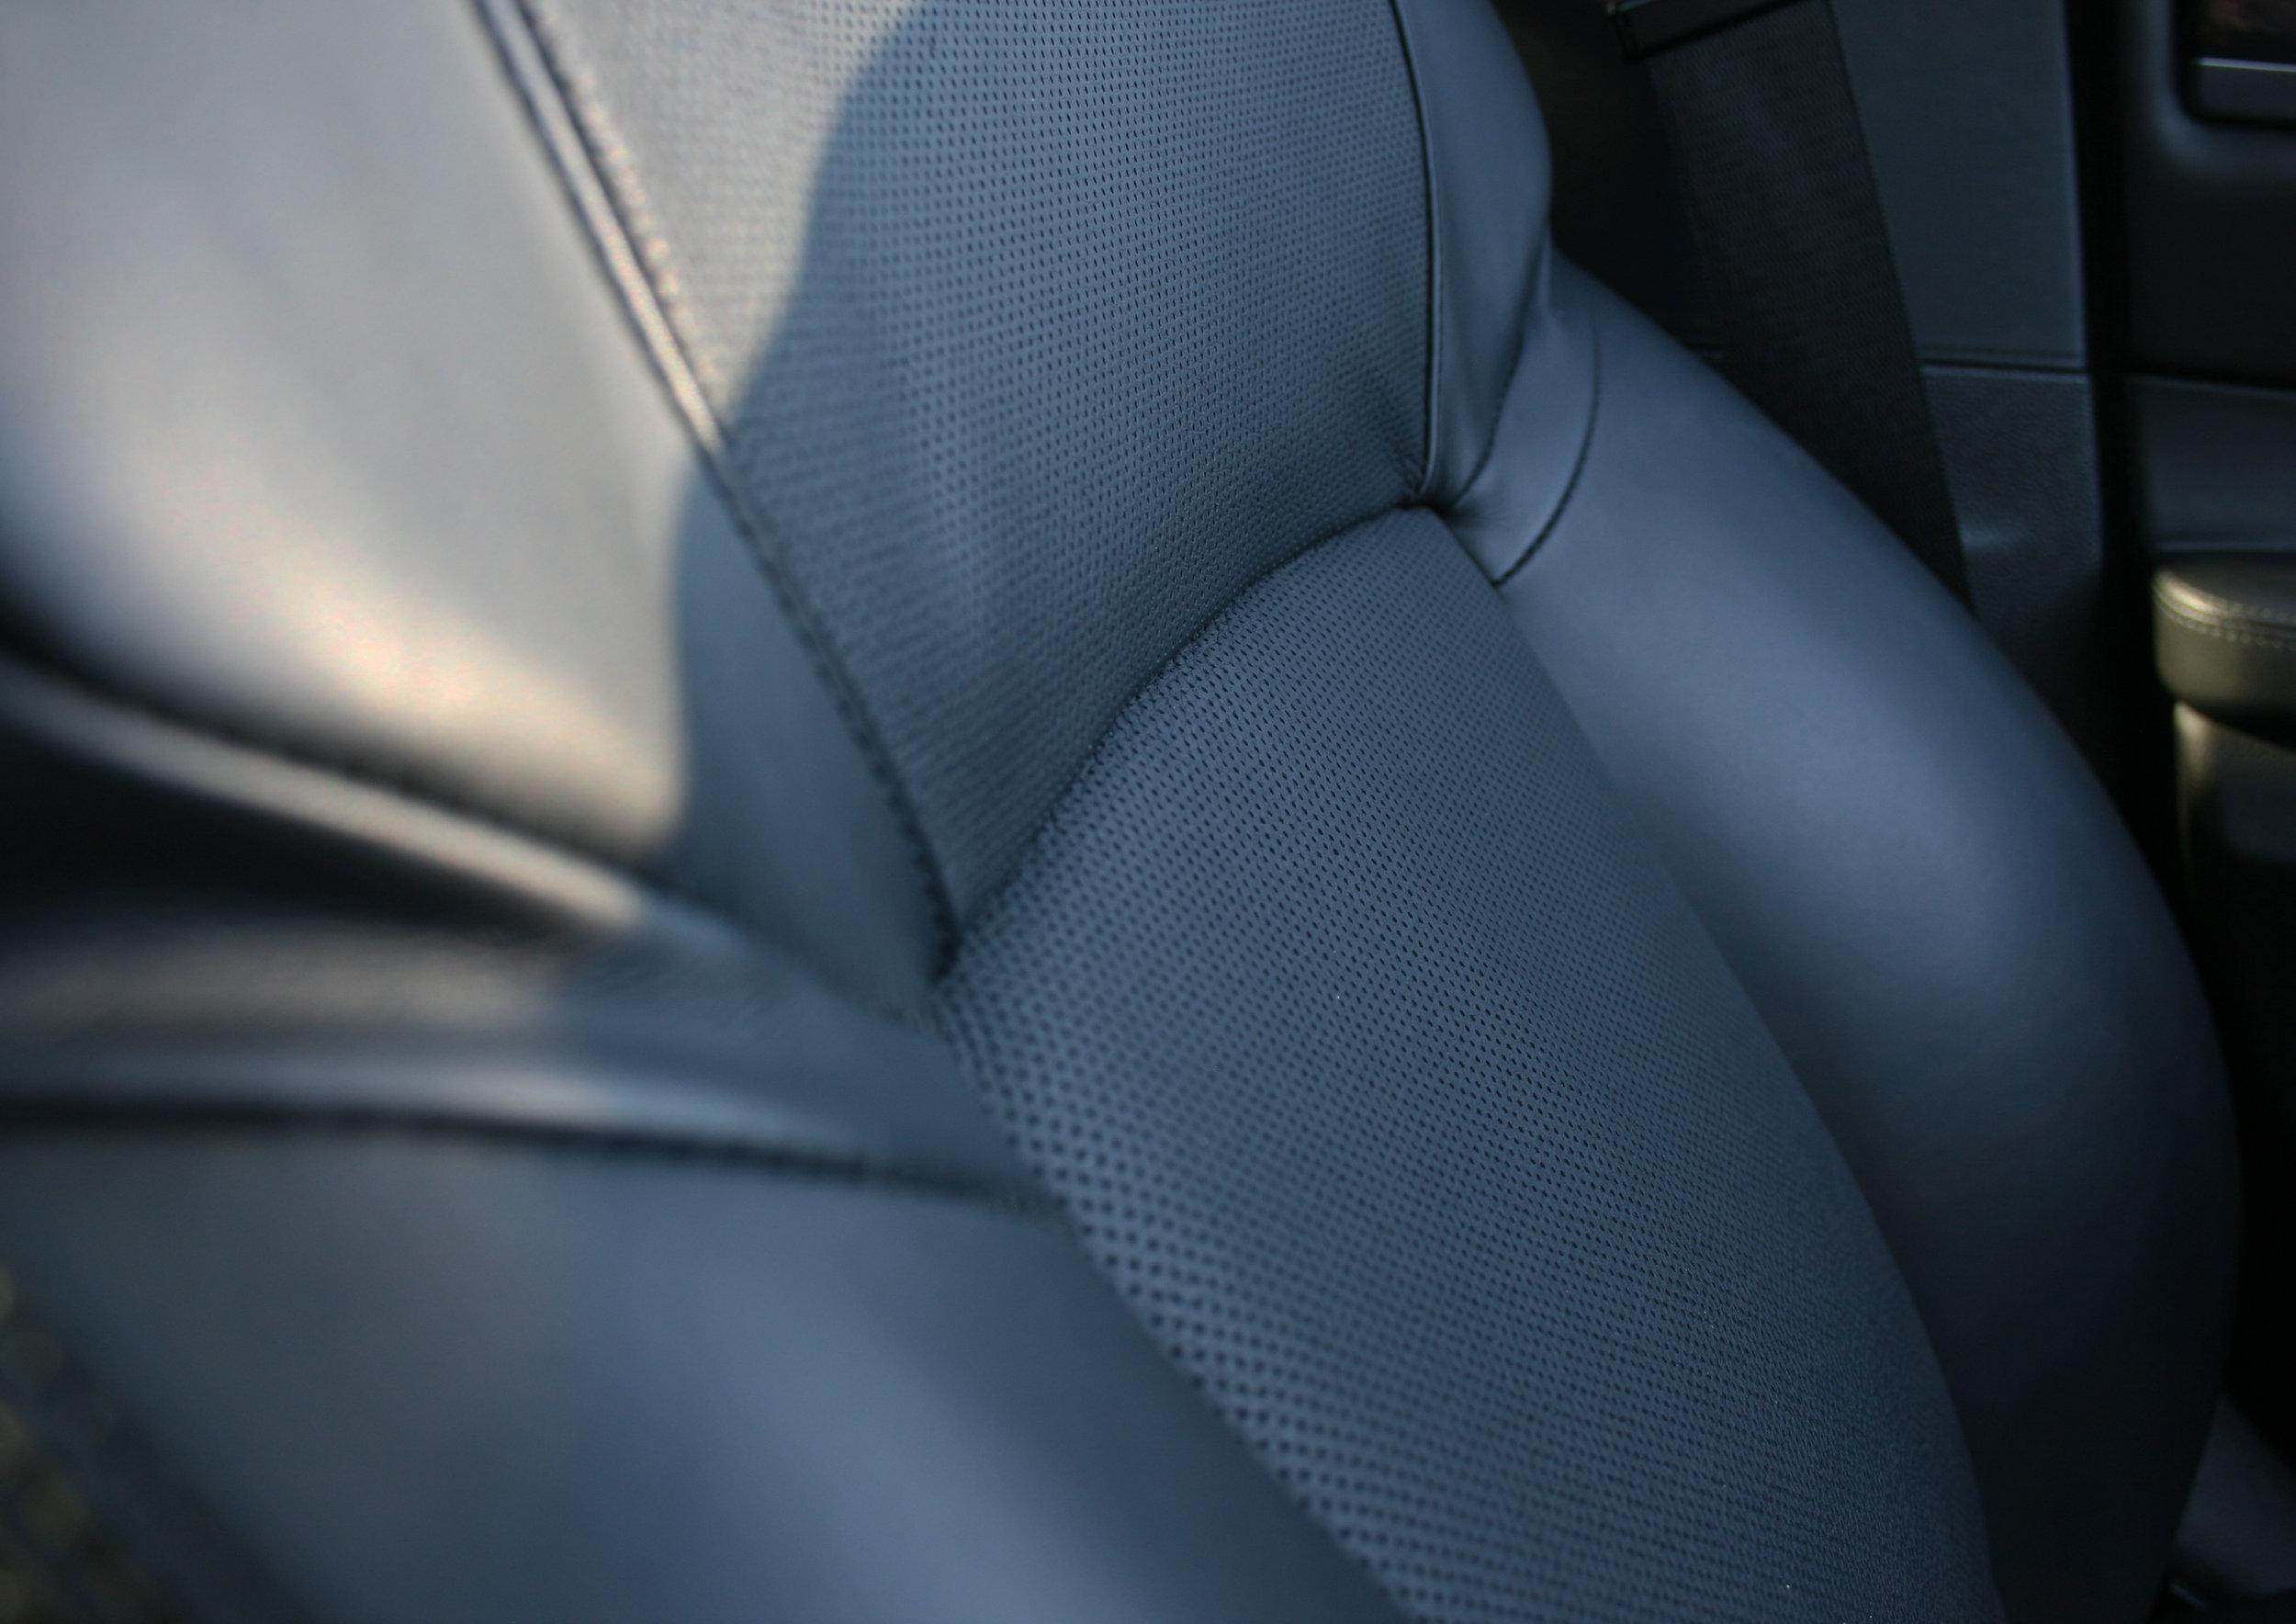 INTERIOR SEAT DETAIL 2.jpg